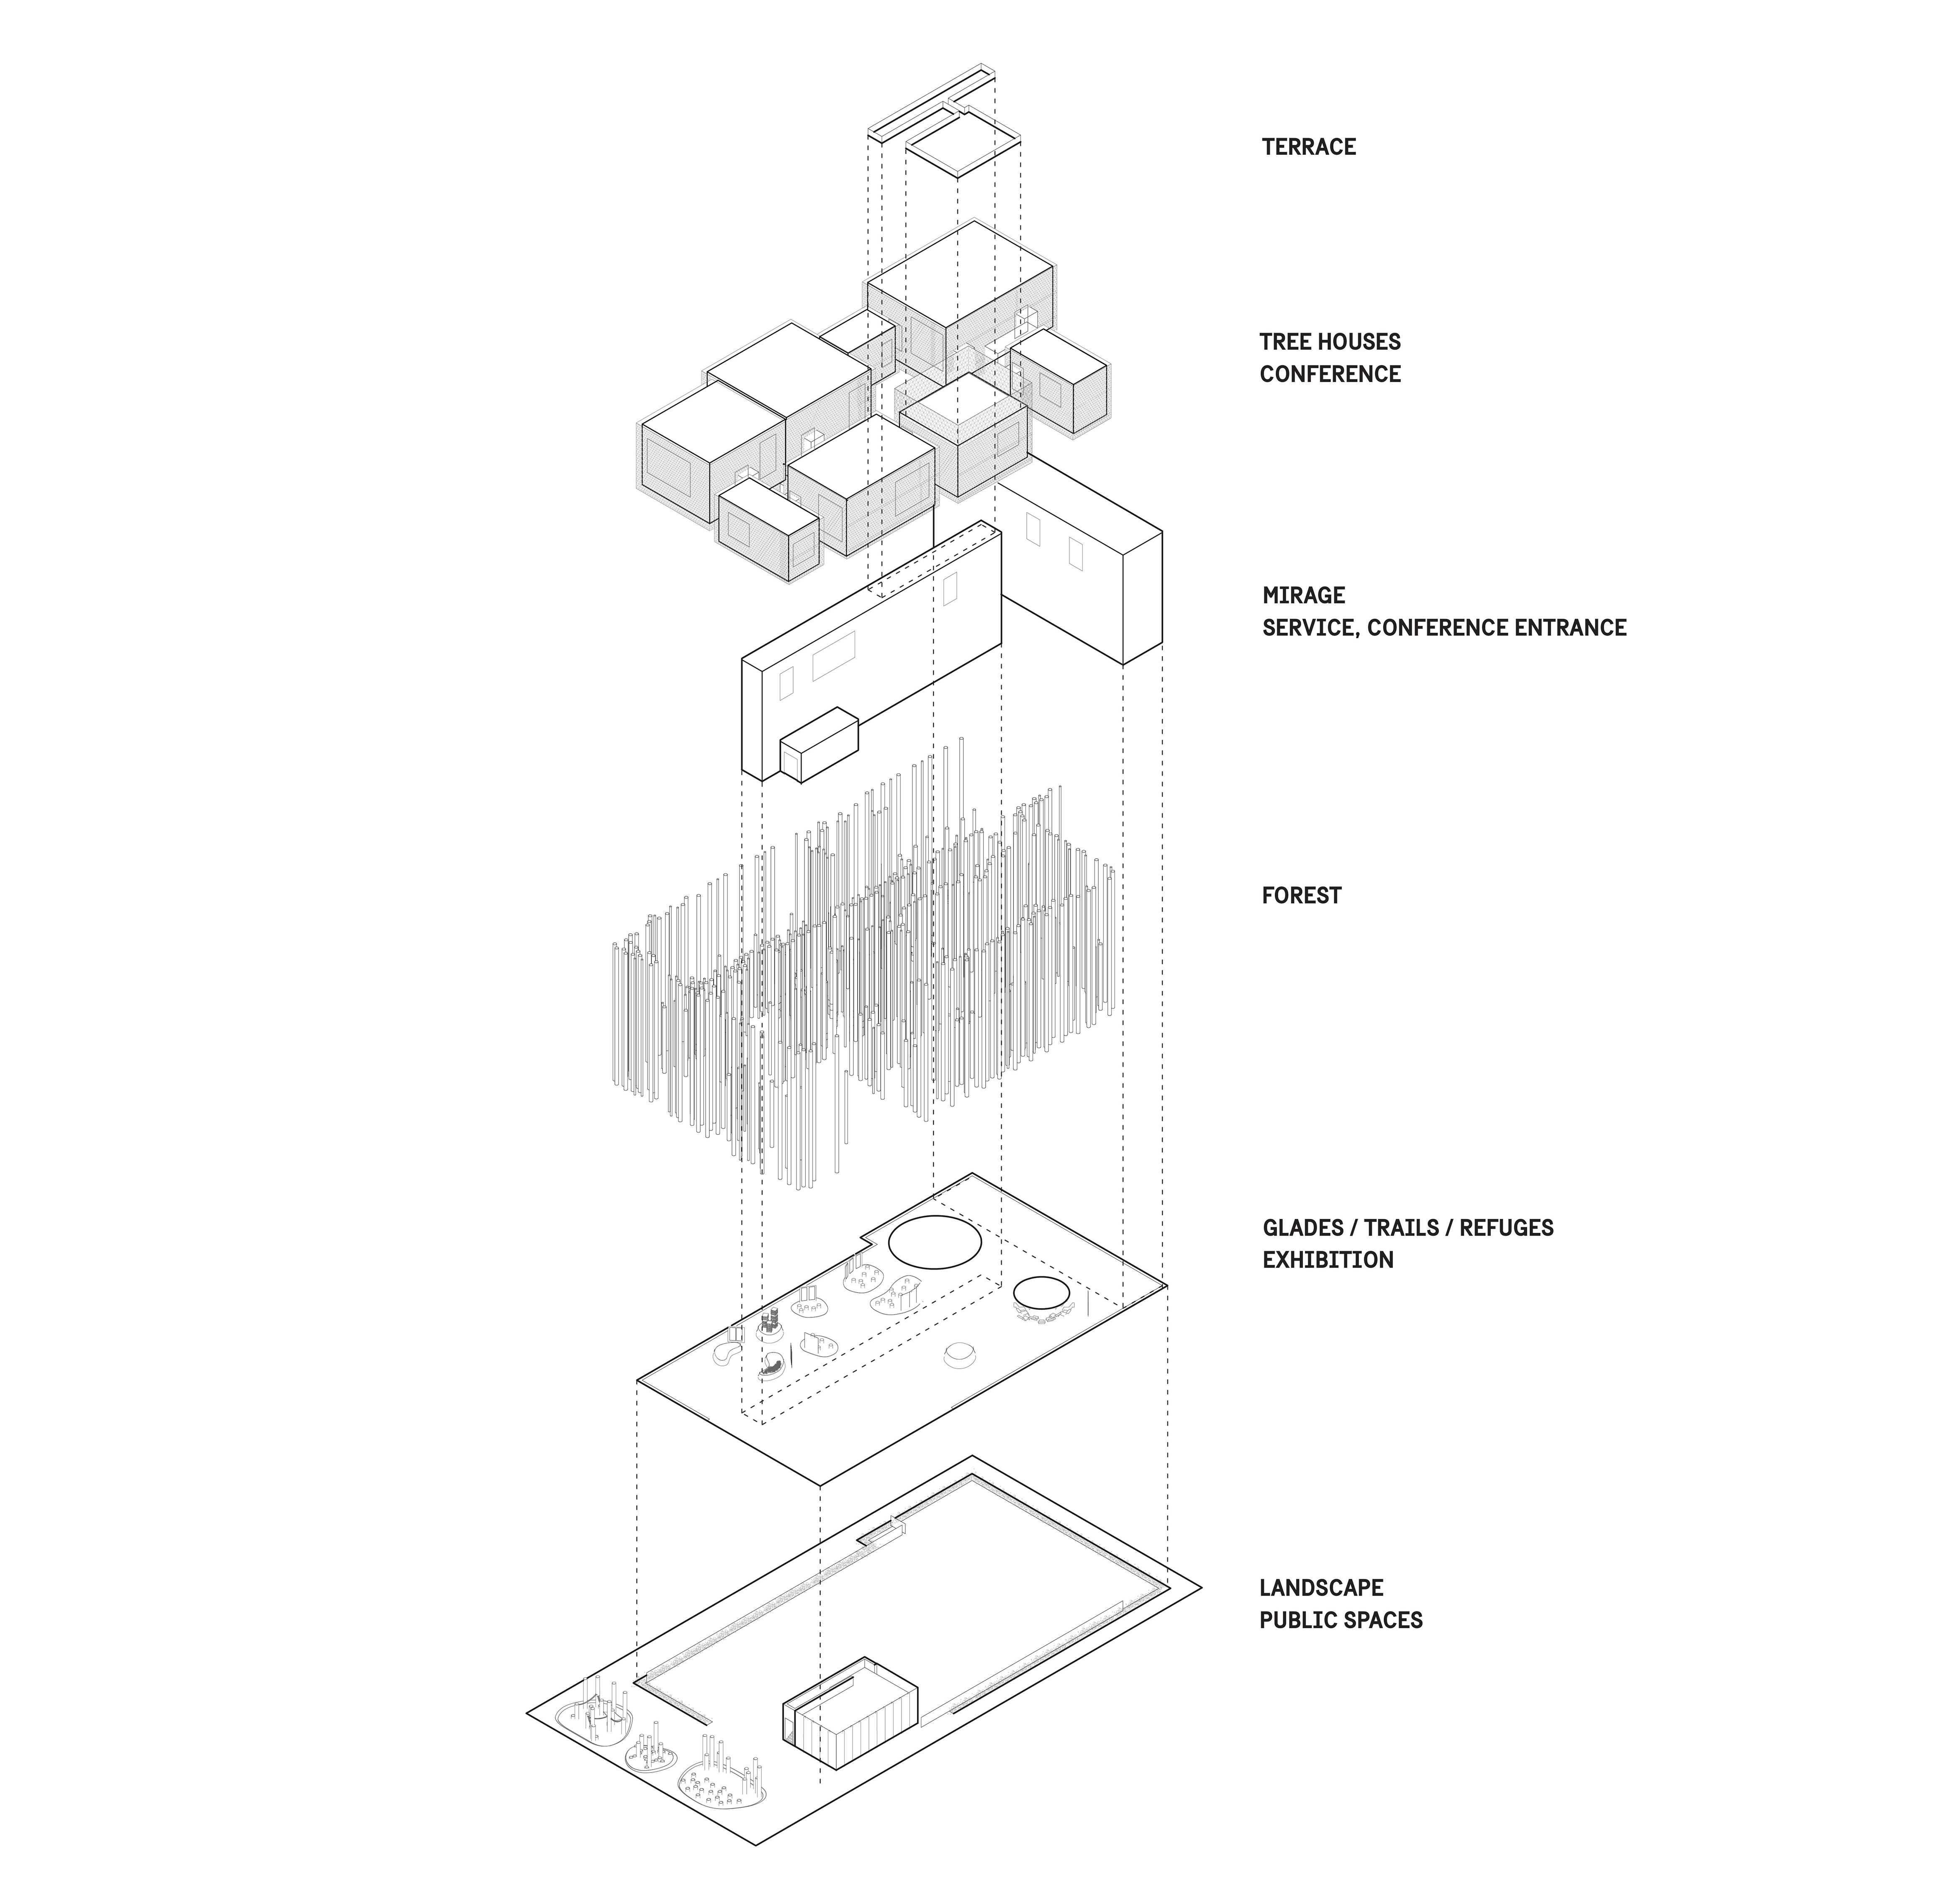 Alessandro-Ripellino-Arkitekter_Studio-Adrien-Gardere_Luigi-Pardo-Architetti_the-forest_axo-05